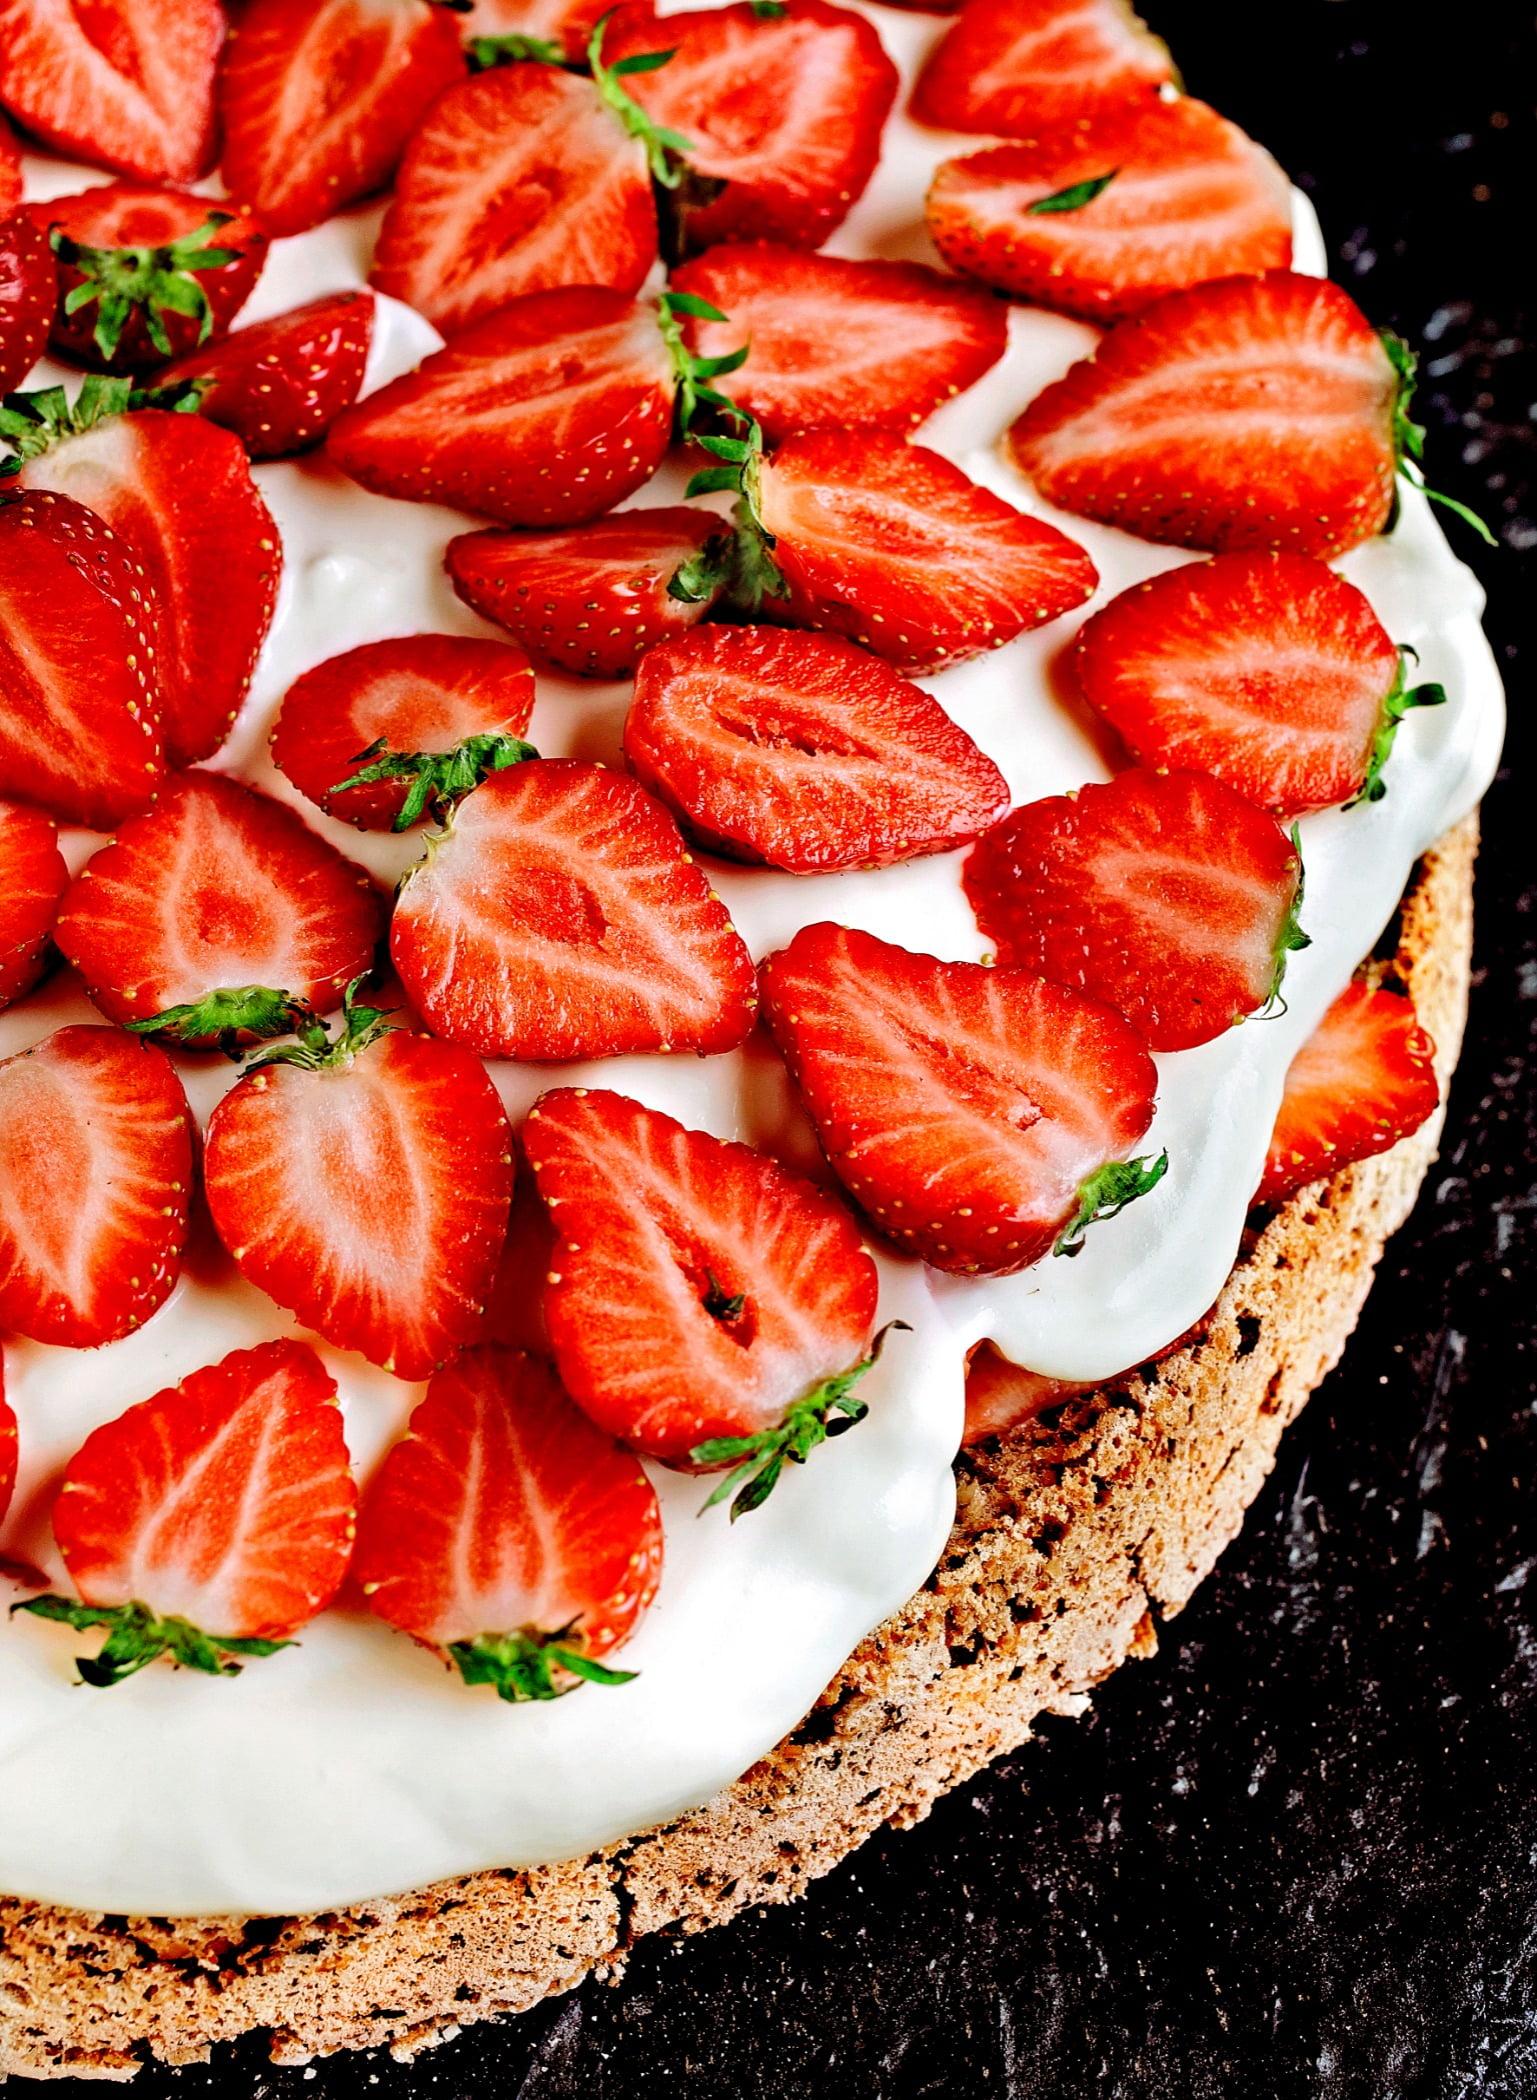 Natural foods, Food, Fruit, Strawberry, Ingredient, Recipe, Strawberries, Cuisine